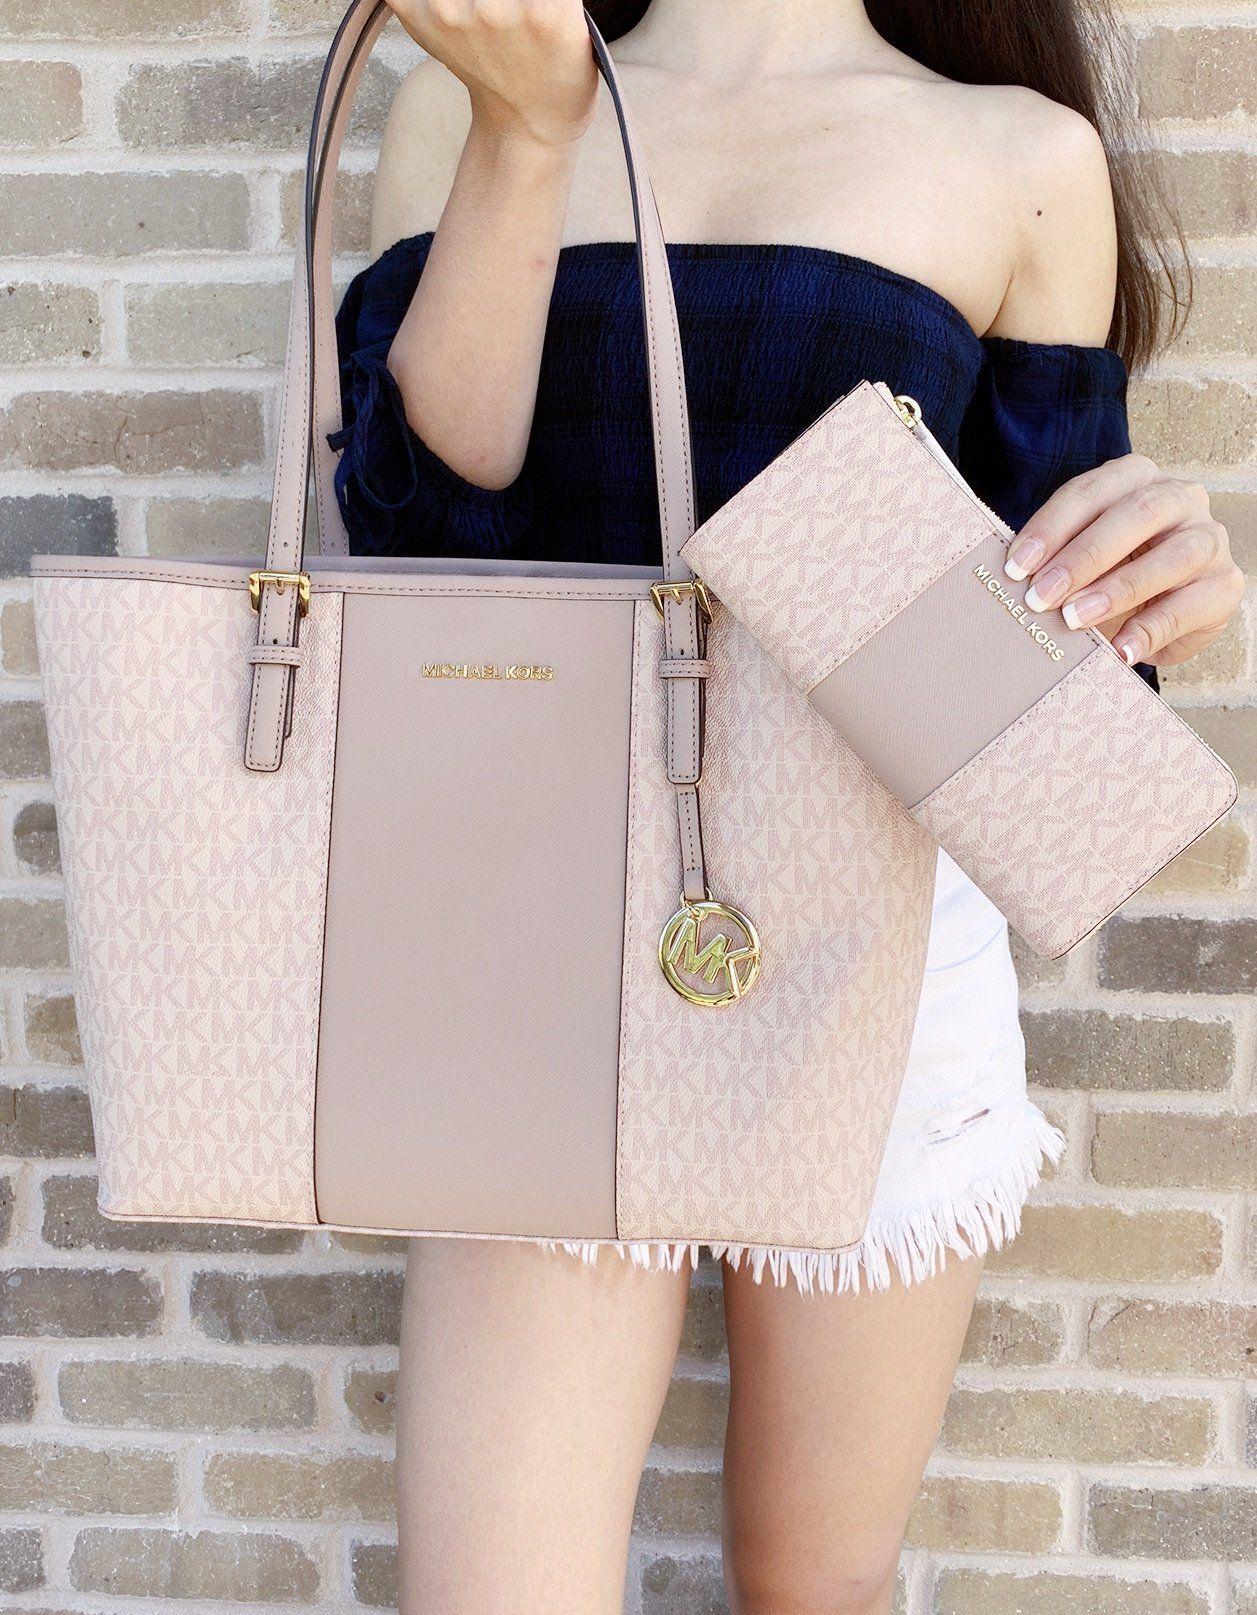 27c94c0b38 Michael Kors Medium Carryall Tote Vanilla MK Signature Ballet Pink Fawn  Wallet SET